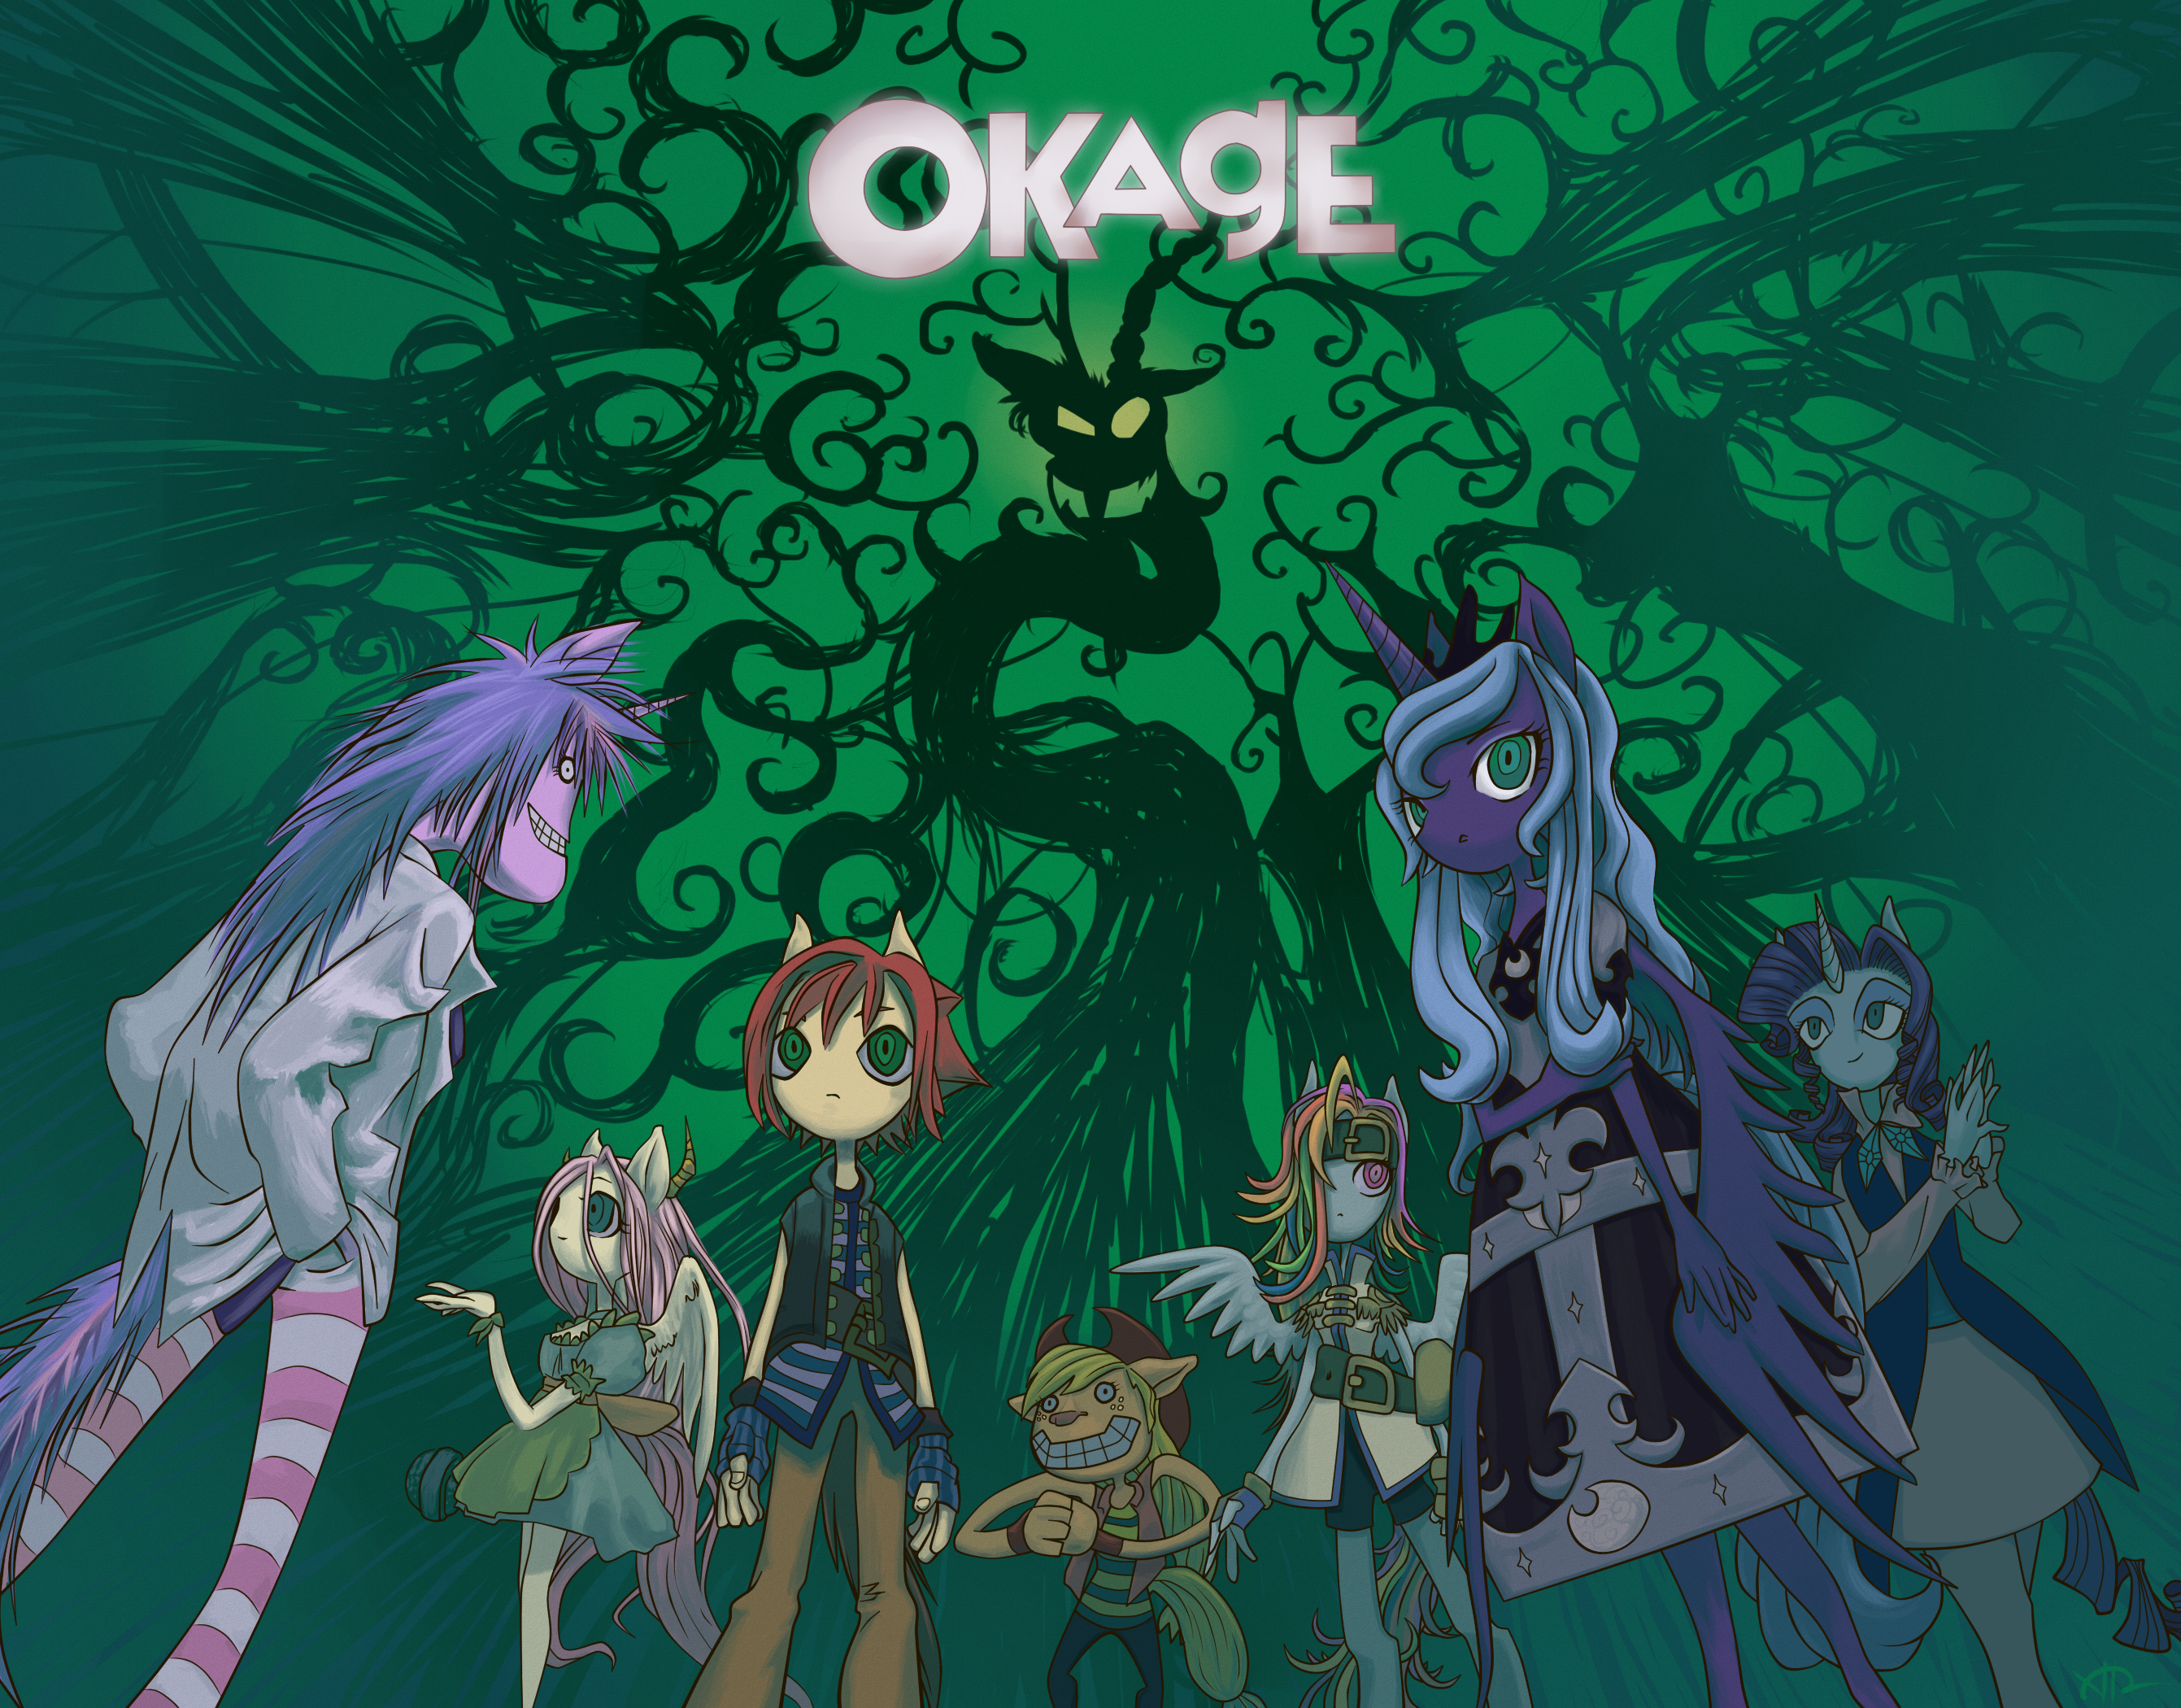 Okage: In the Shadow of Discord by Bluest-Ayemel